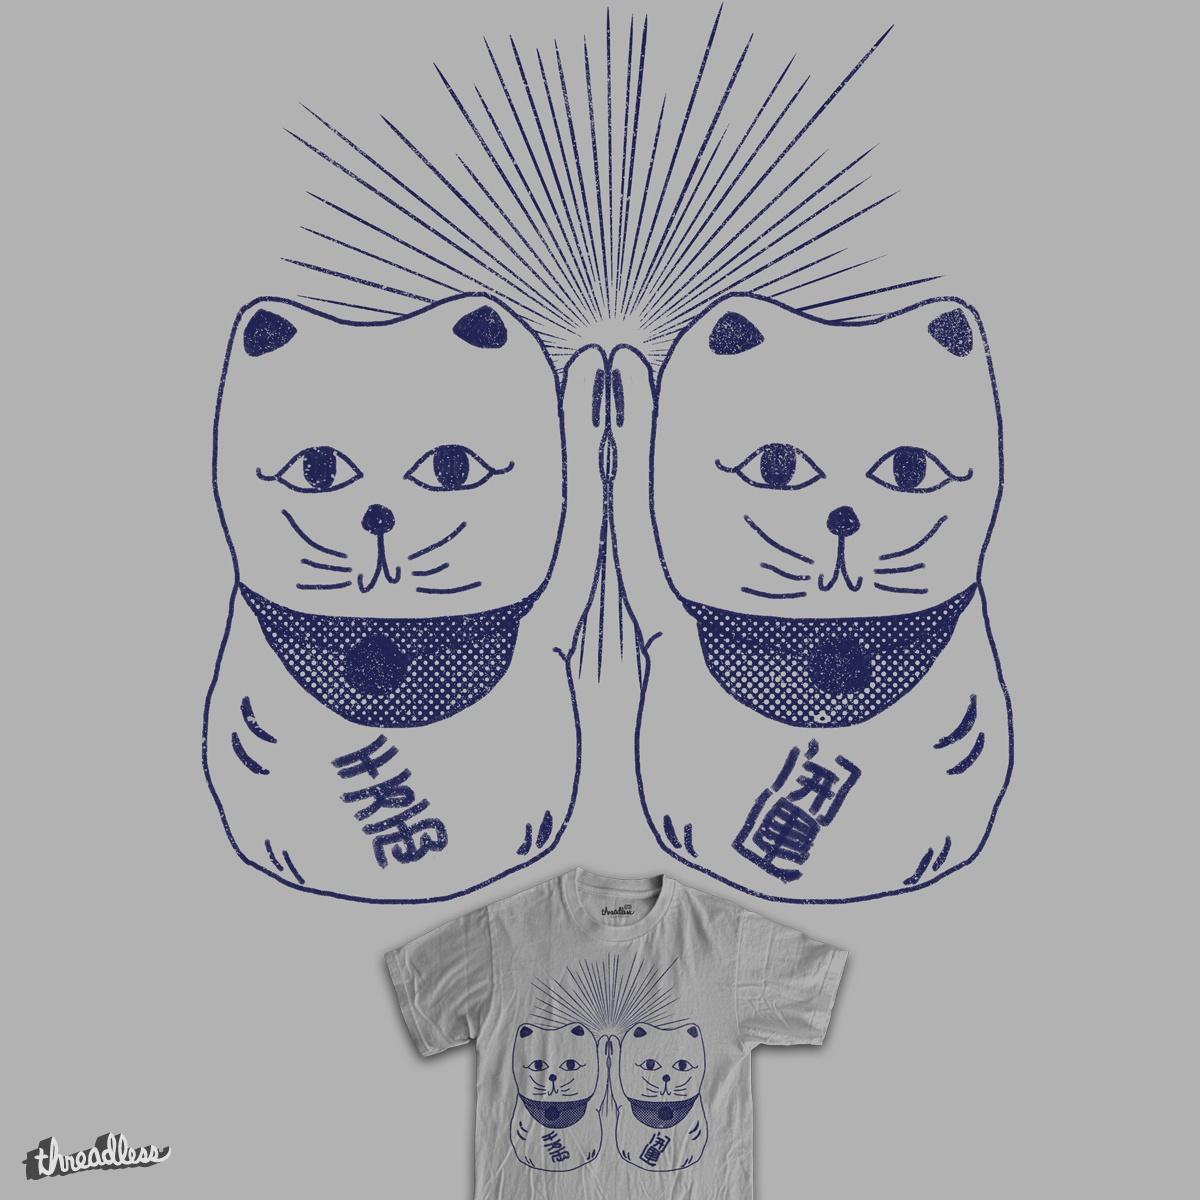 High Five Maneki Neko by RL76 on Threadless